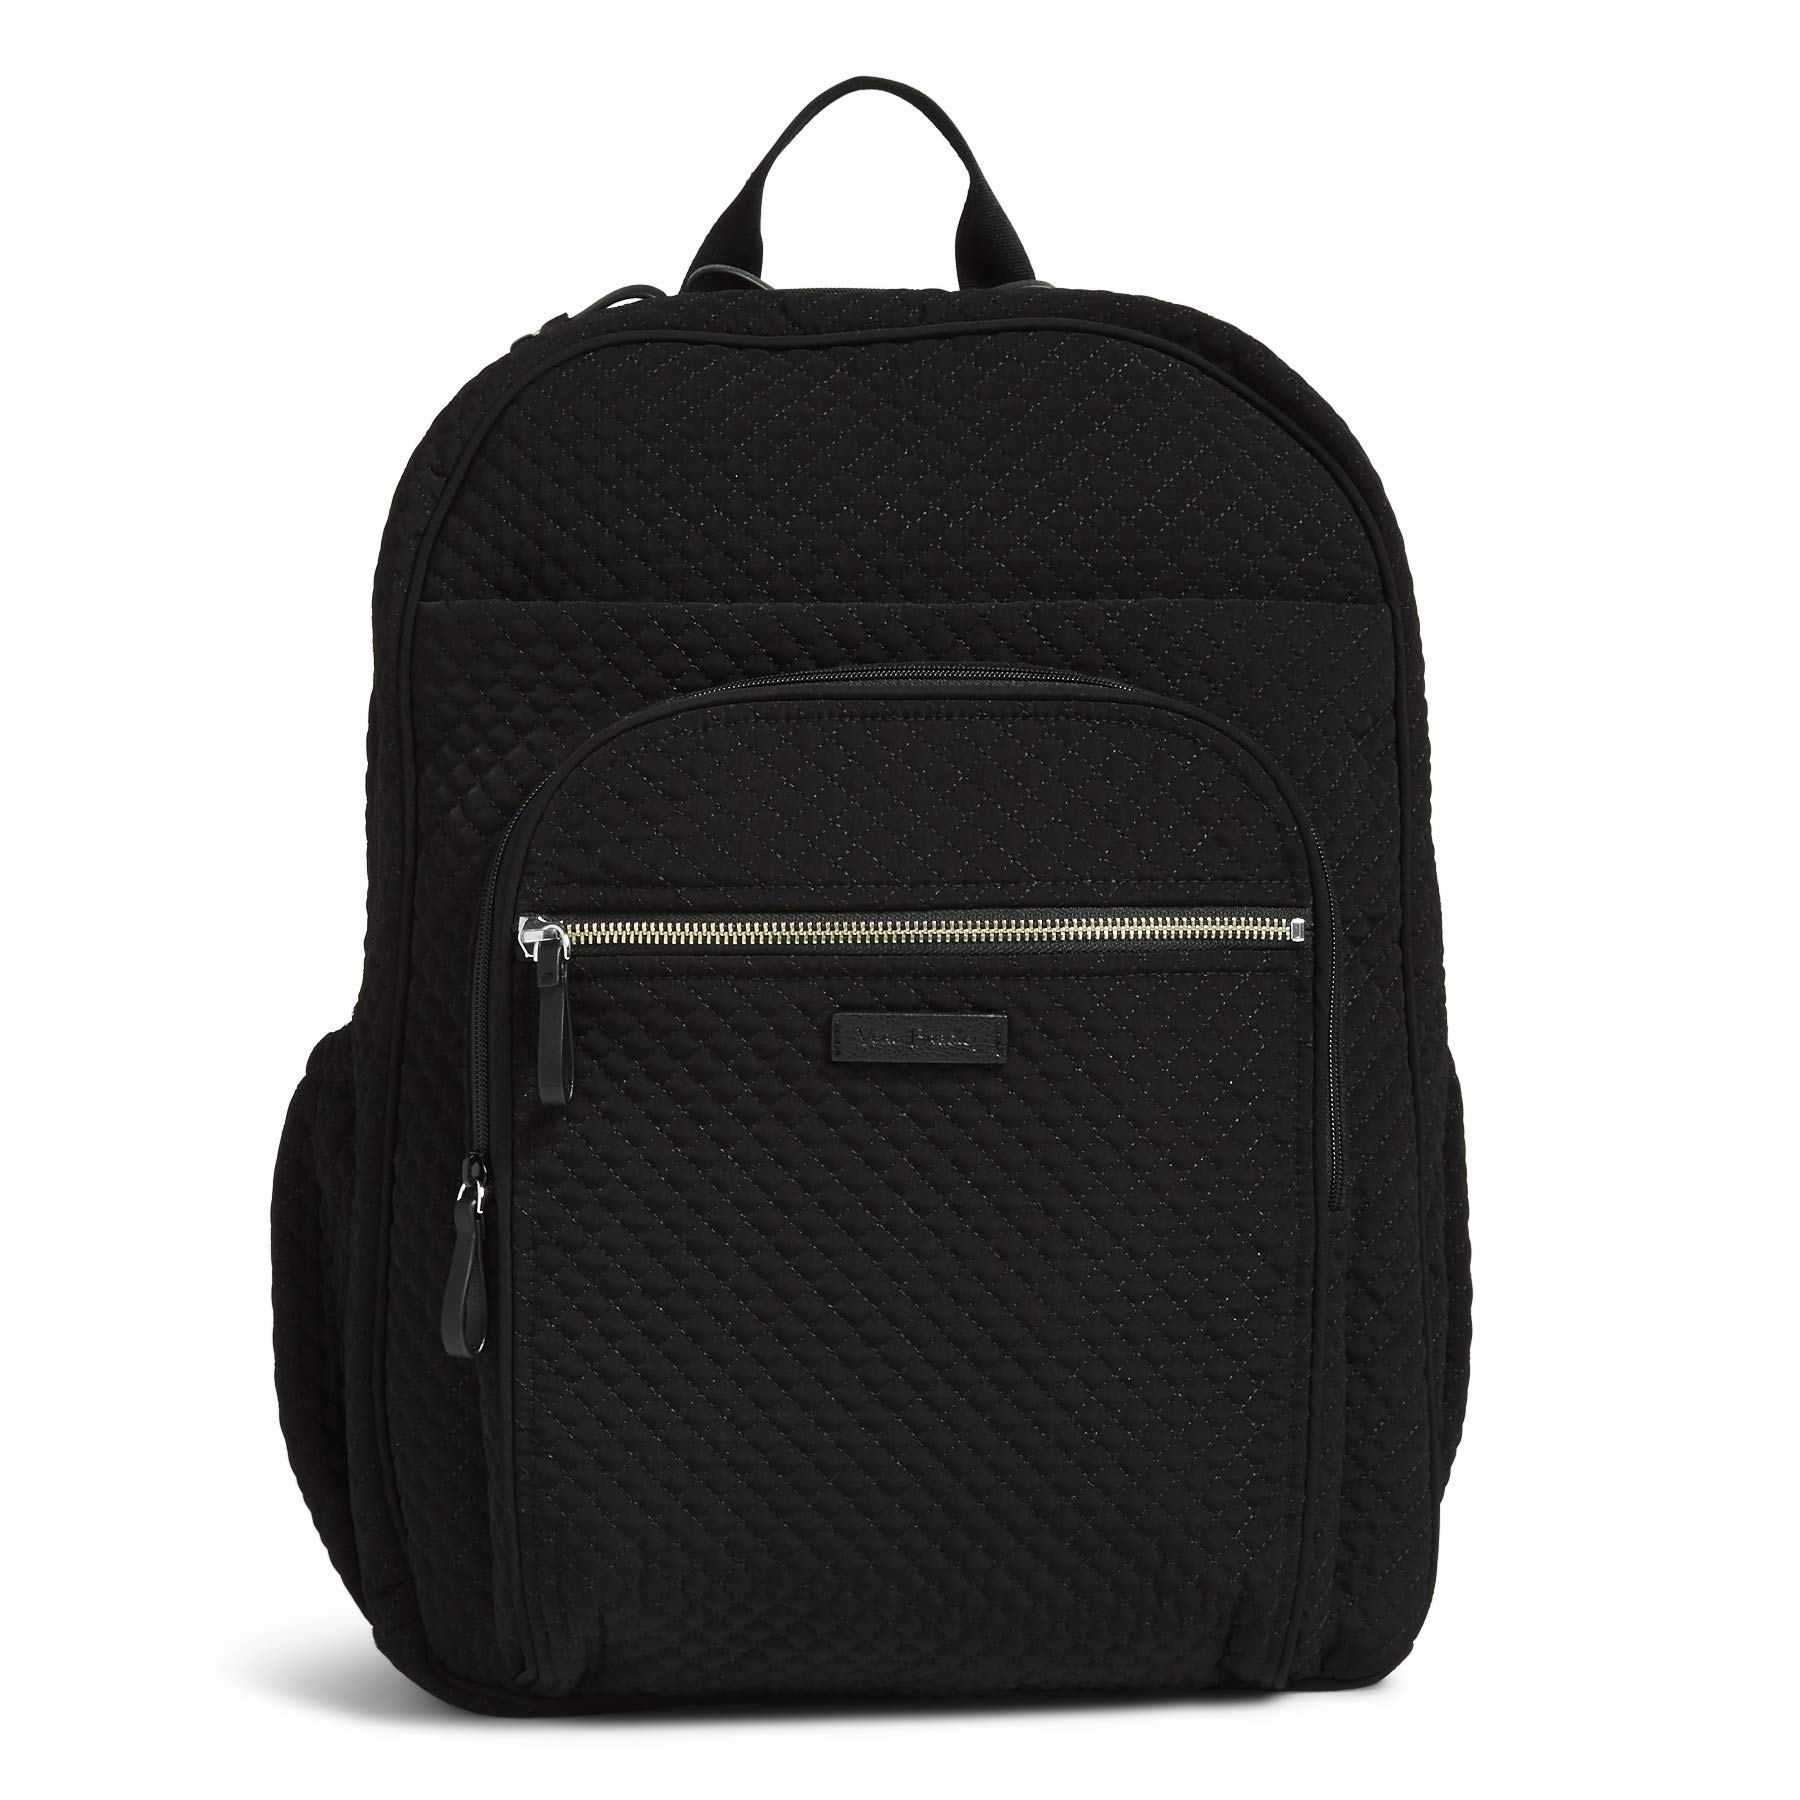 Vera Bradley Iconic XL Campus Backpack, Microfiber, Classic Black by Vera Bradley